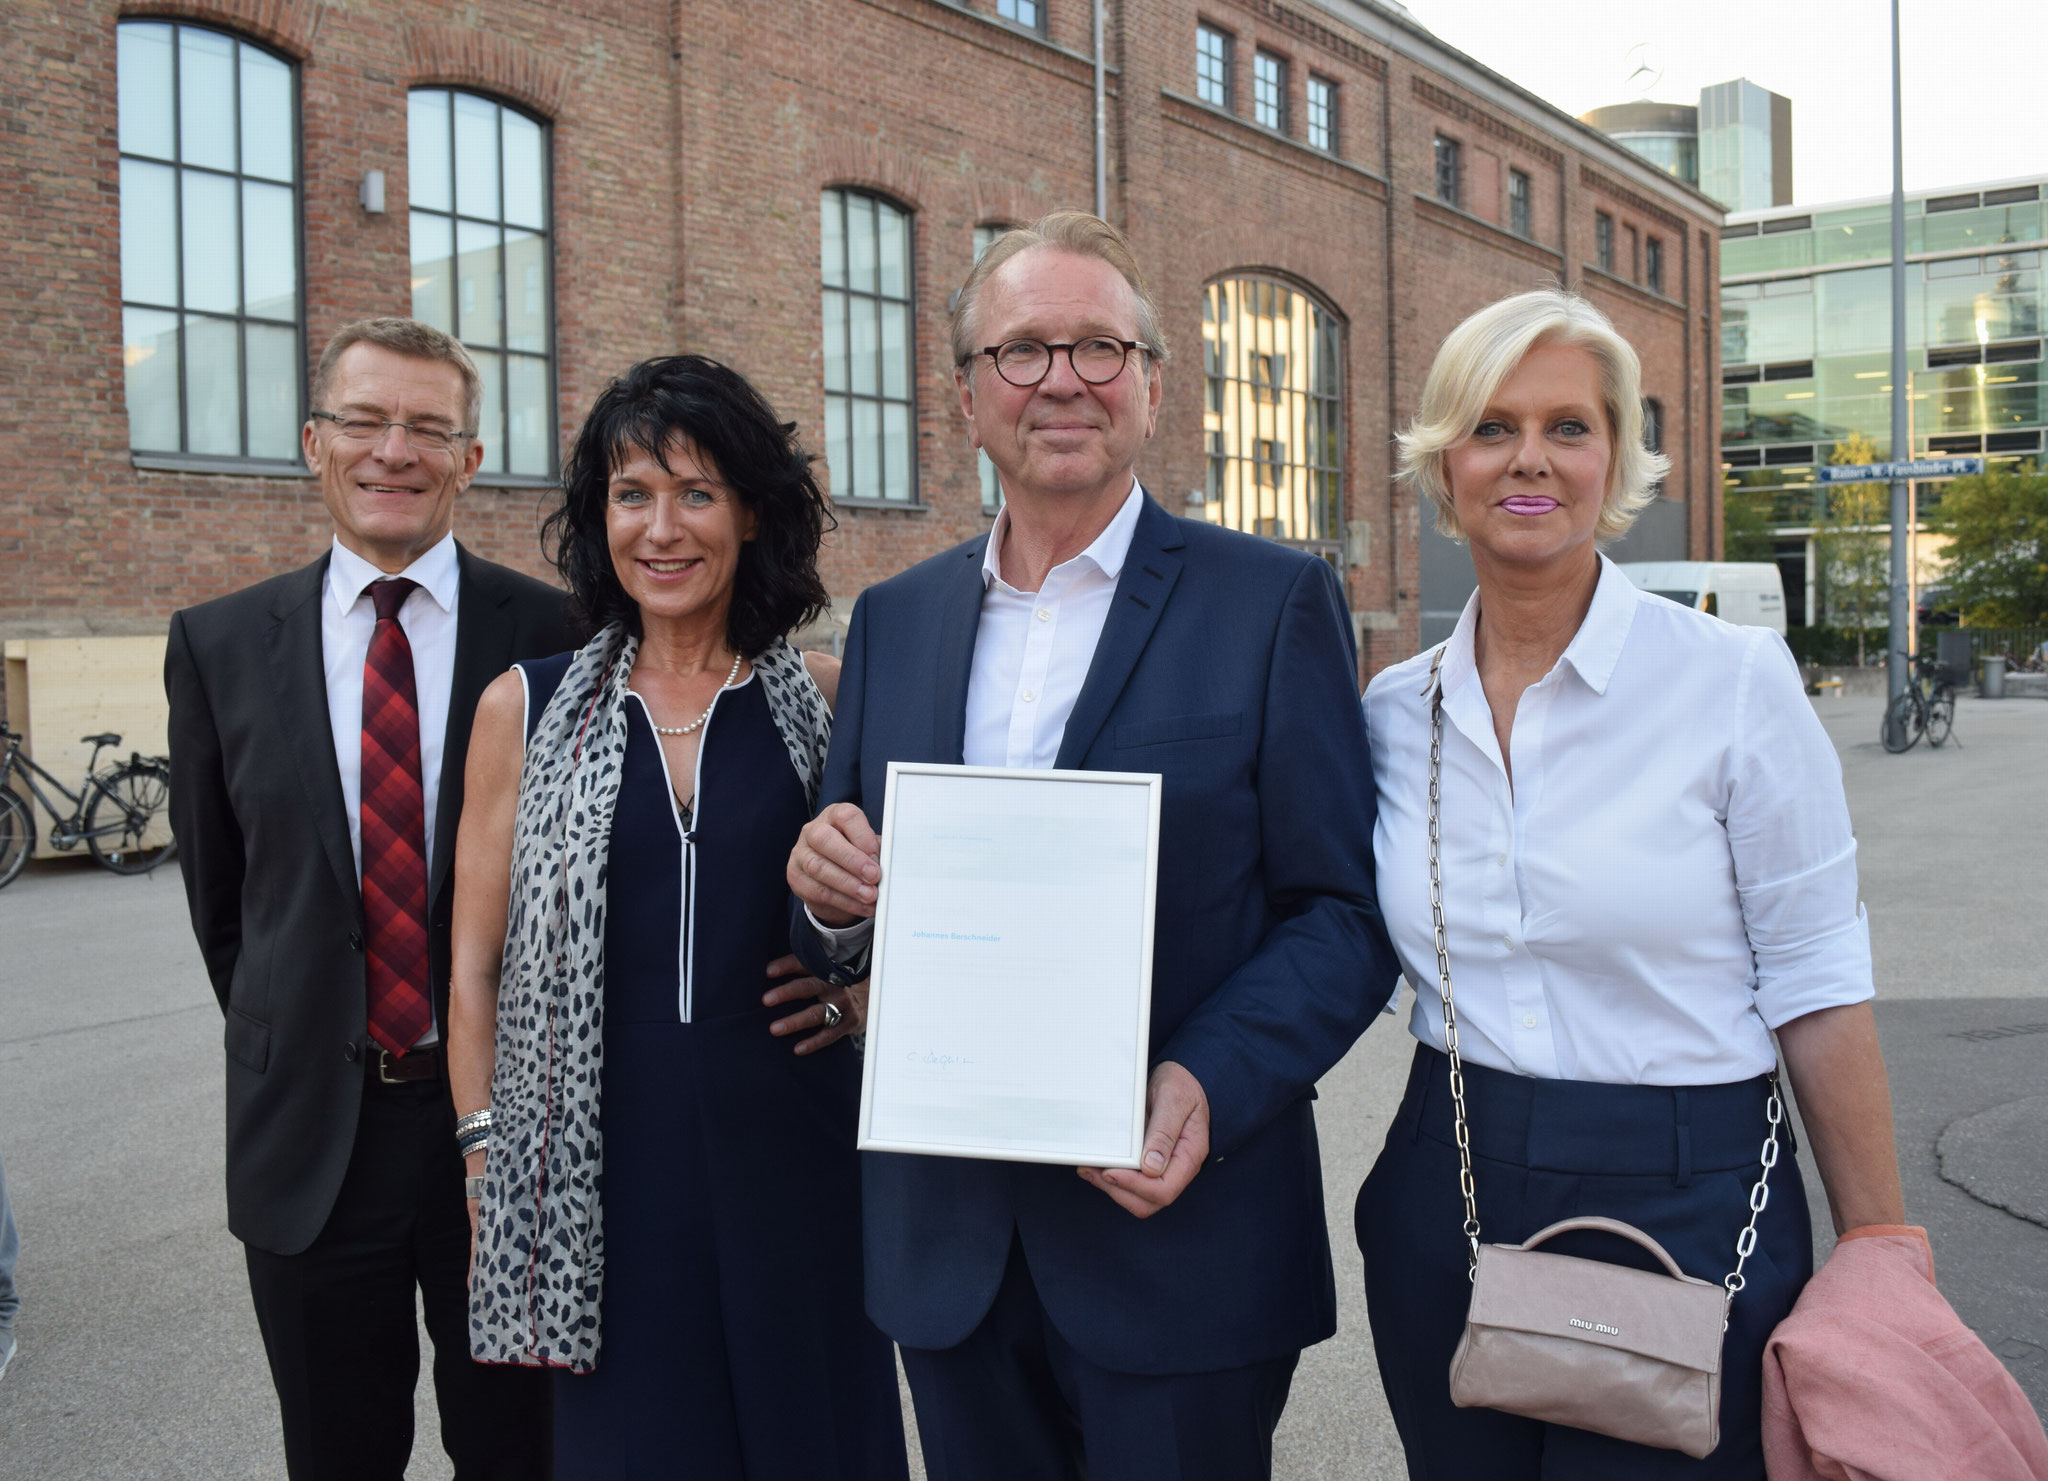 Foto: Schmid / Ministerialdirektor Schütz, Kammerpräsidentin Degenhardt,  Johannes + Gudrun Berschneider